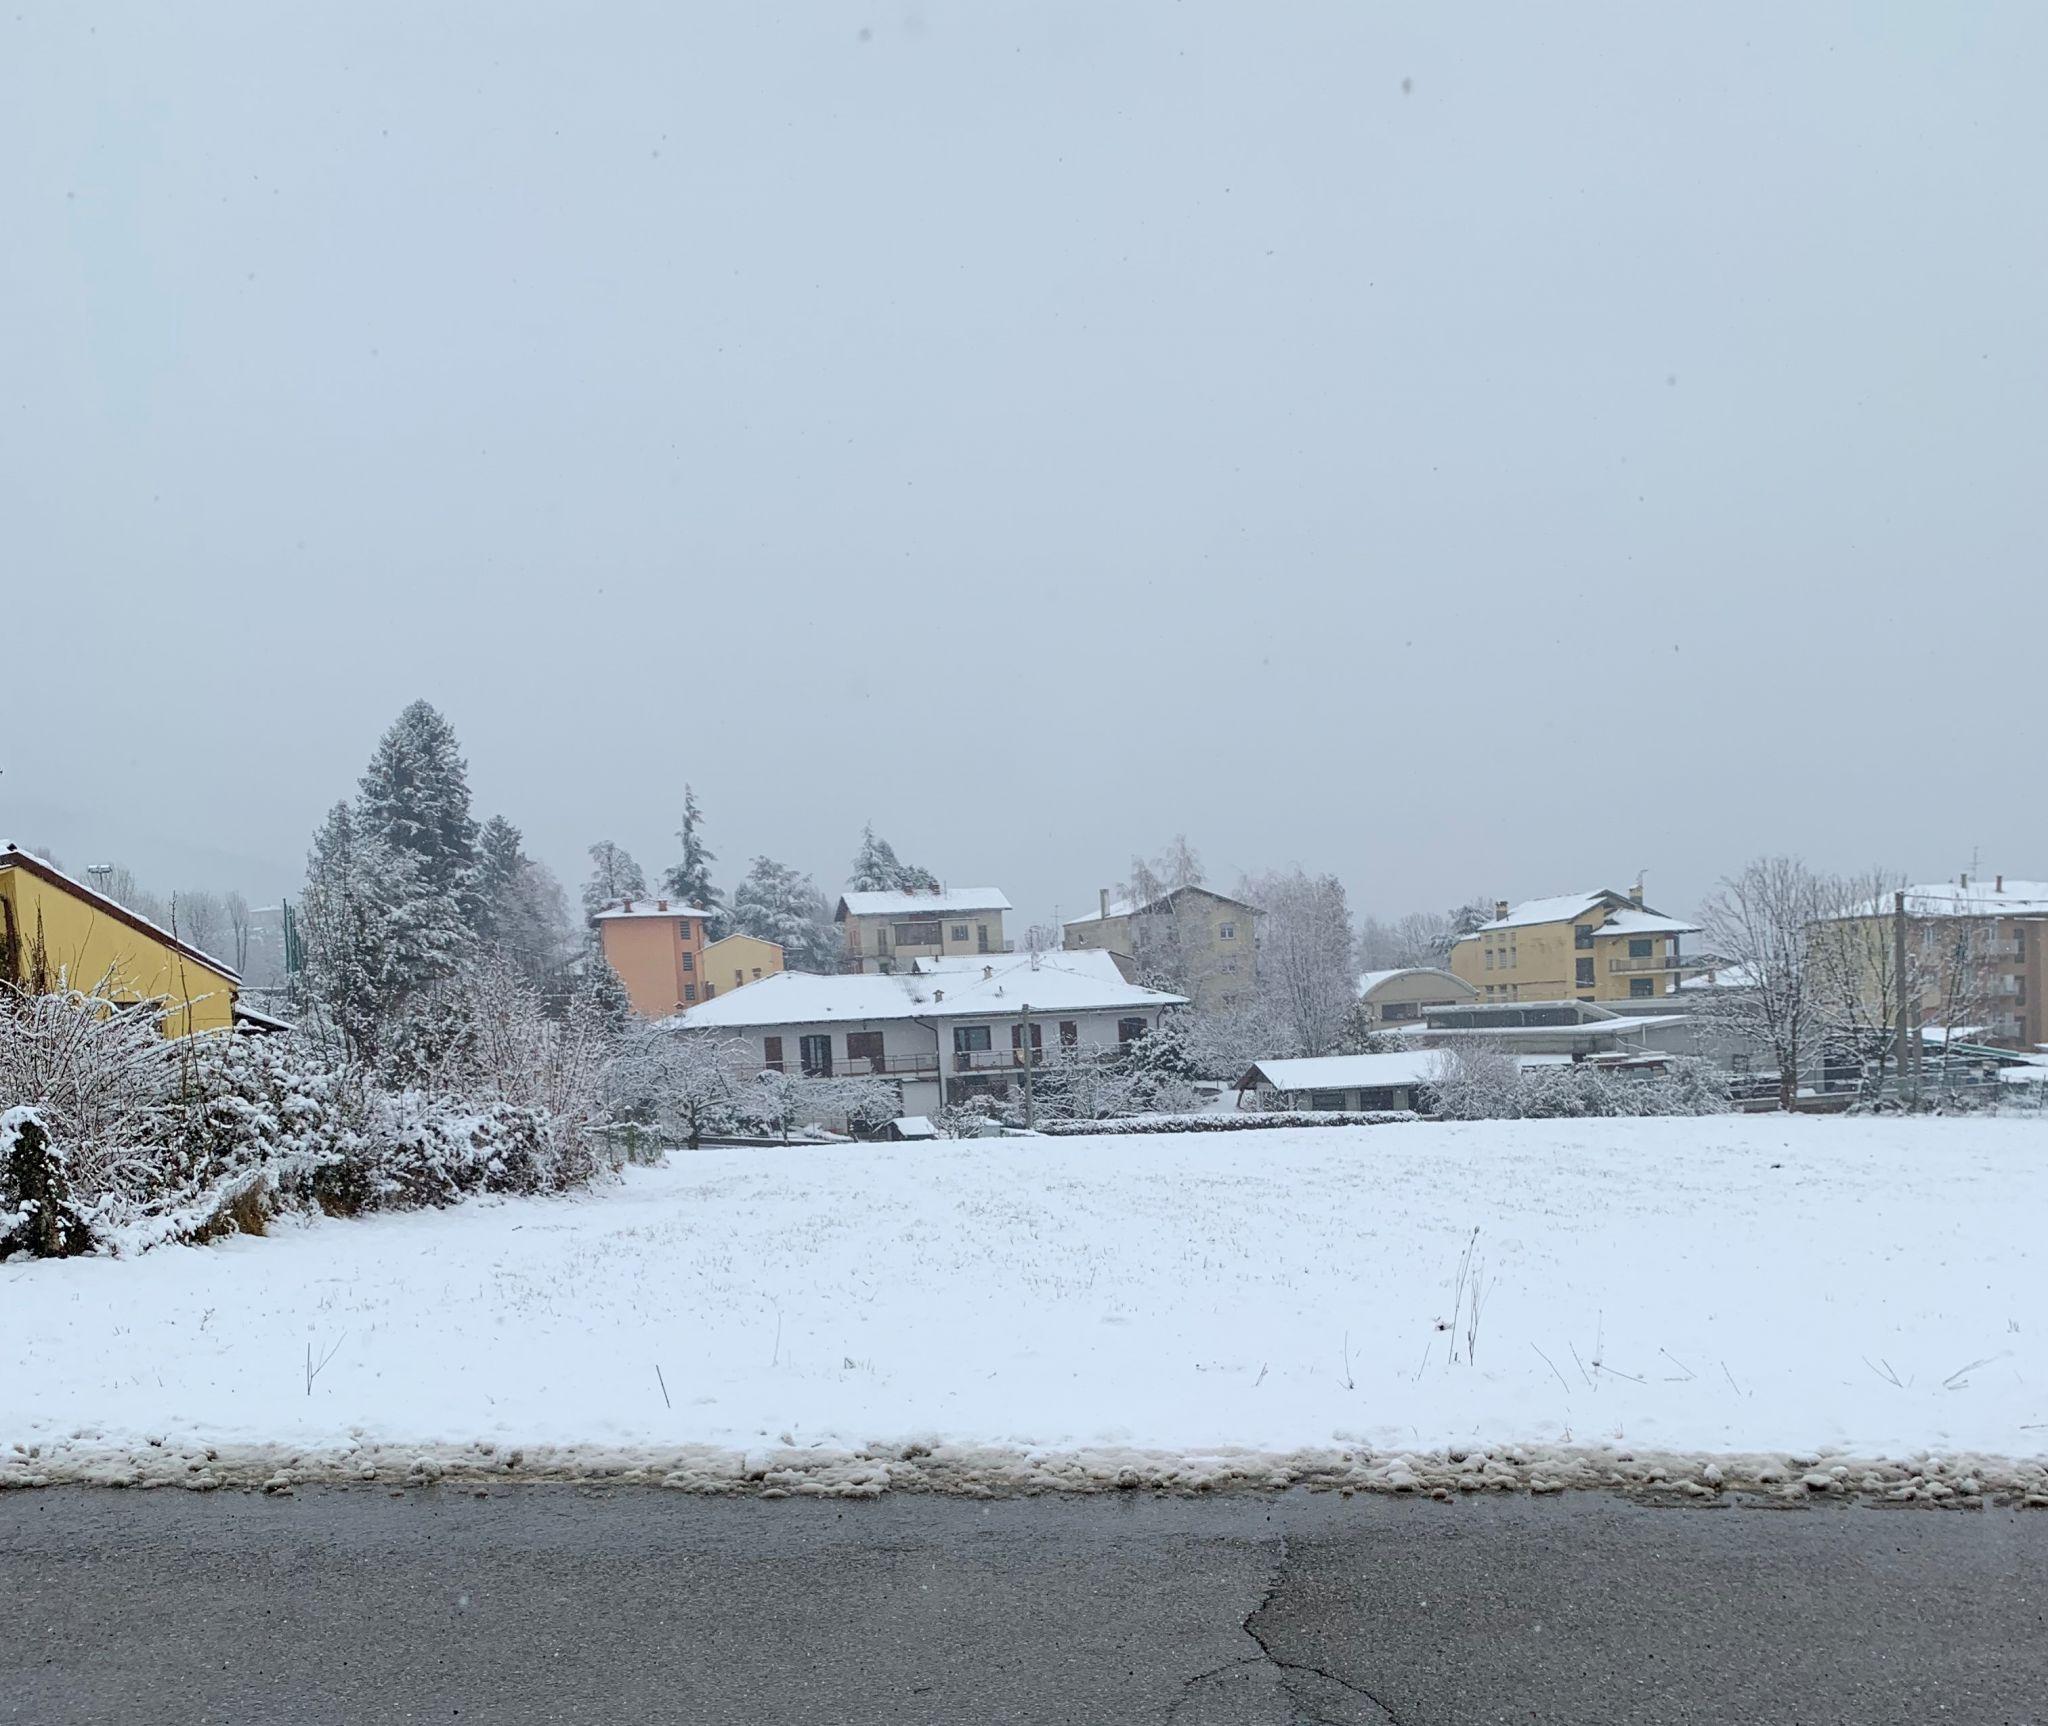 snow in the countryside 3 1440x1214 - Snow in the countryside